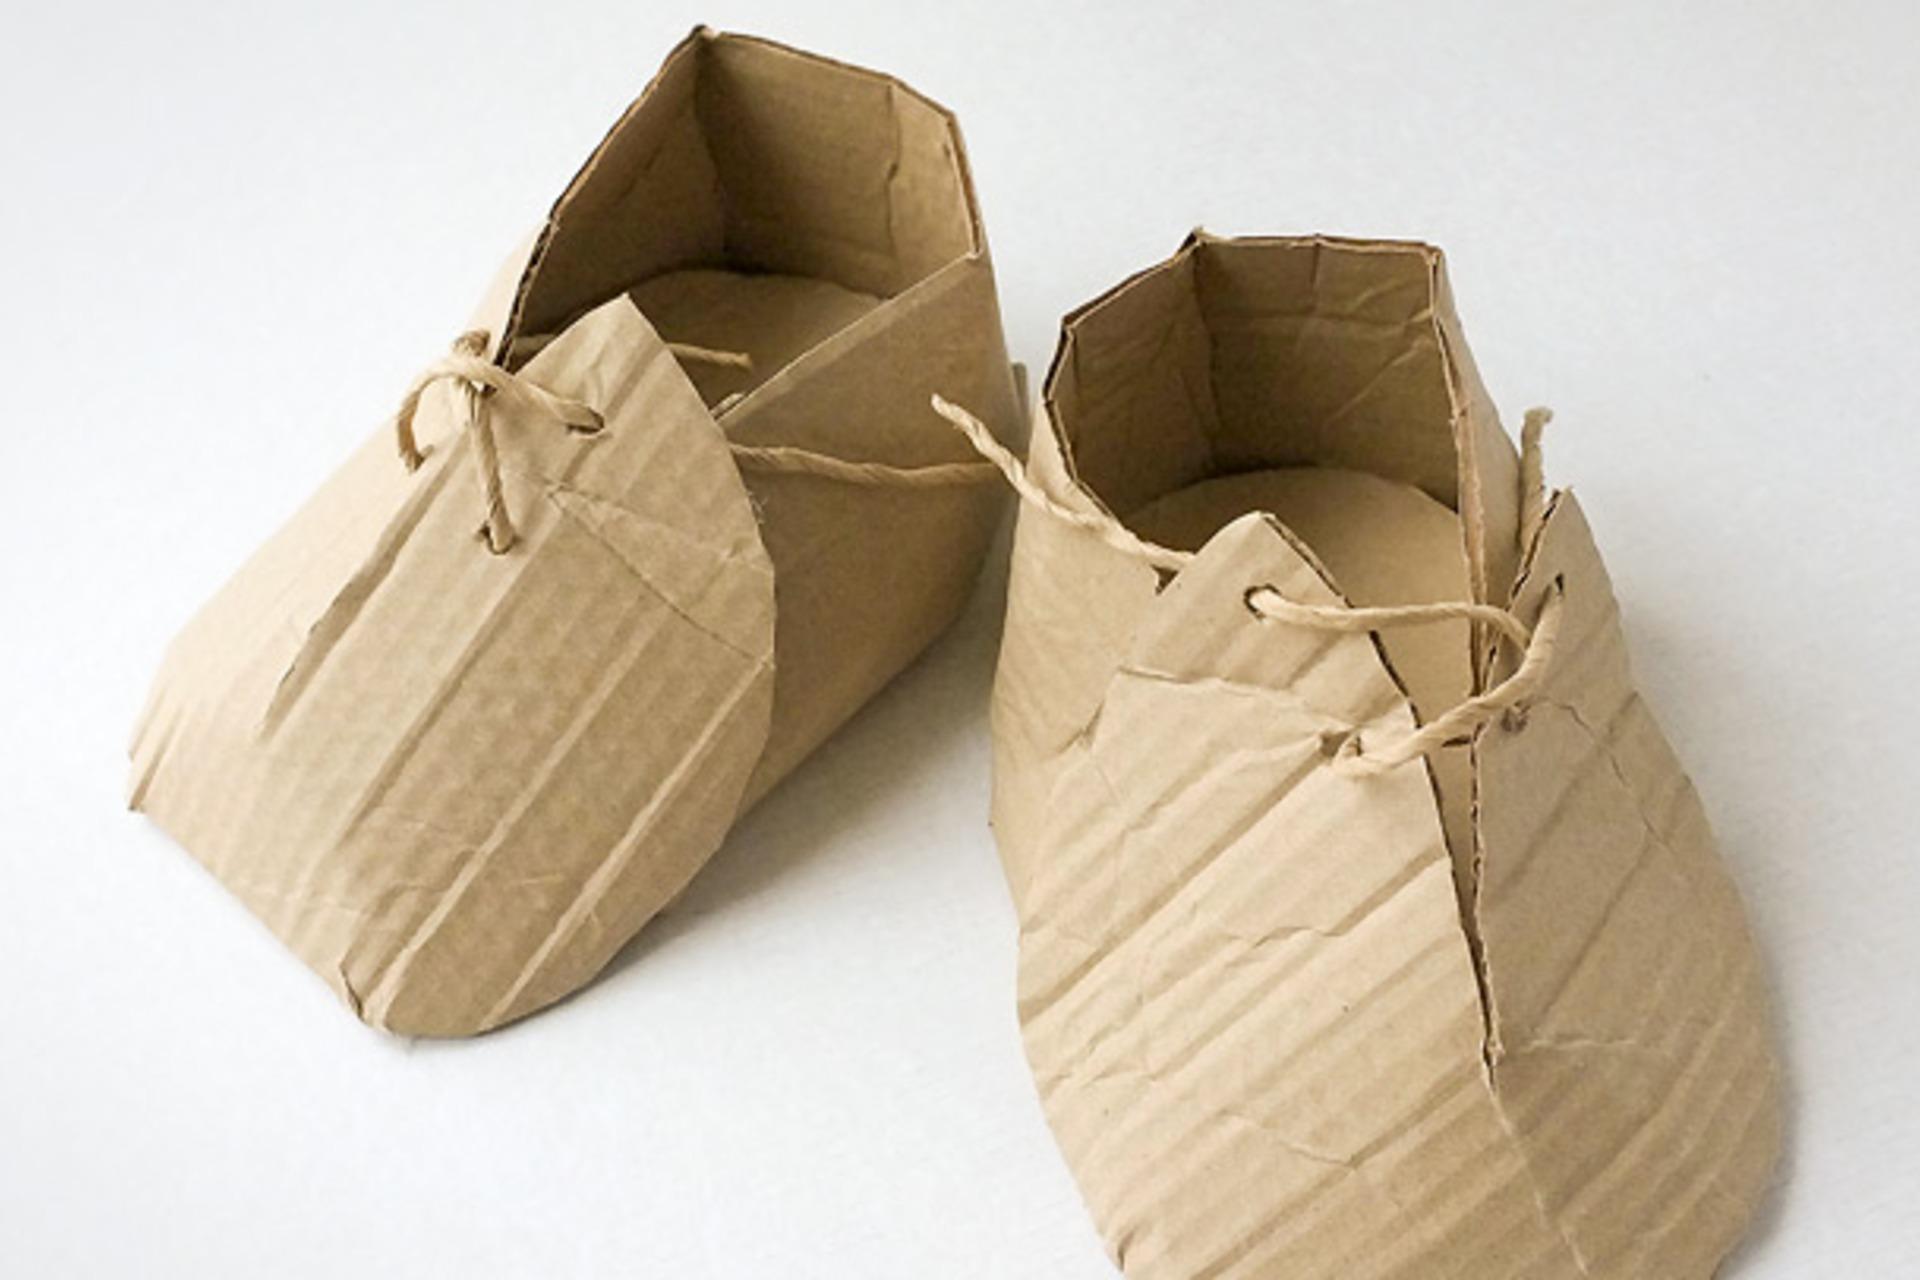 Make Clothing from Cardboard - DIY